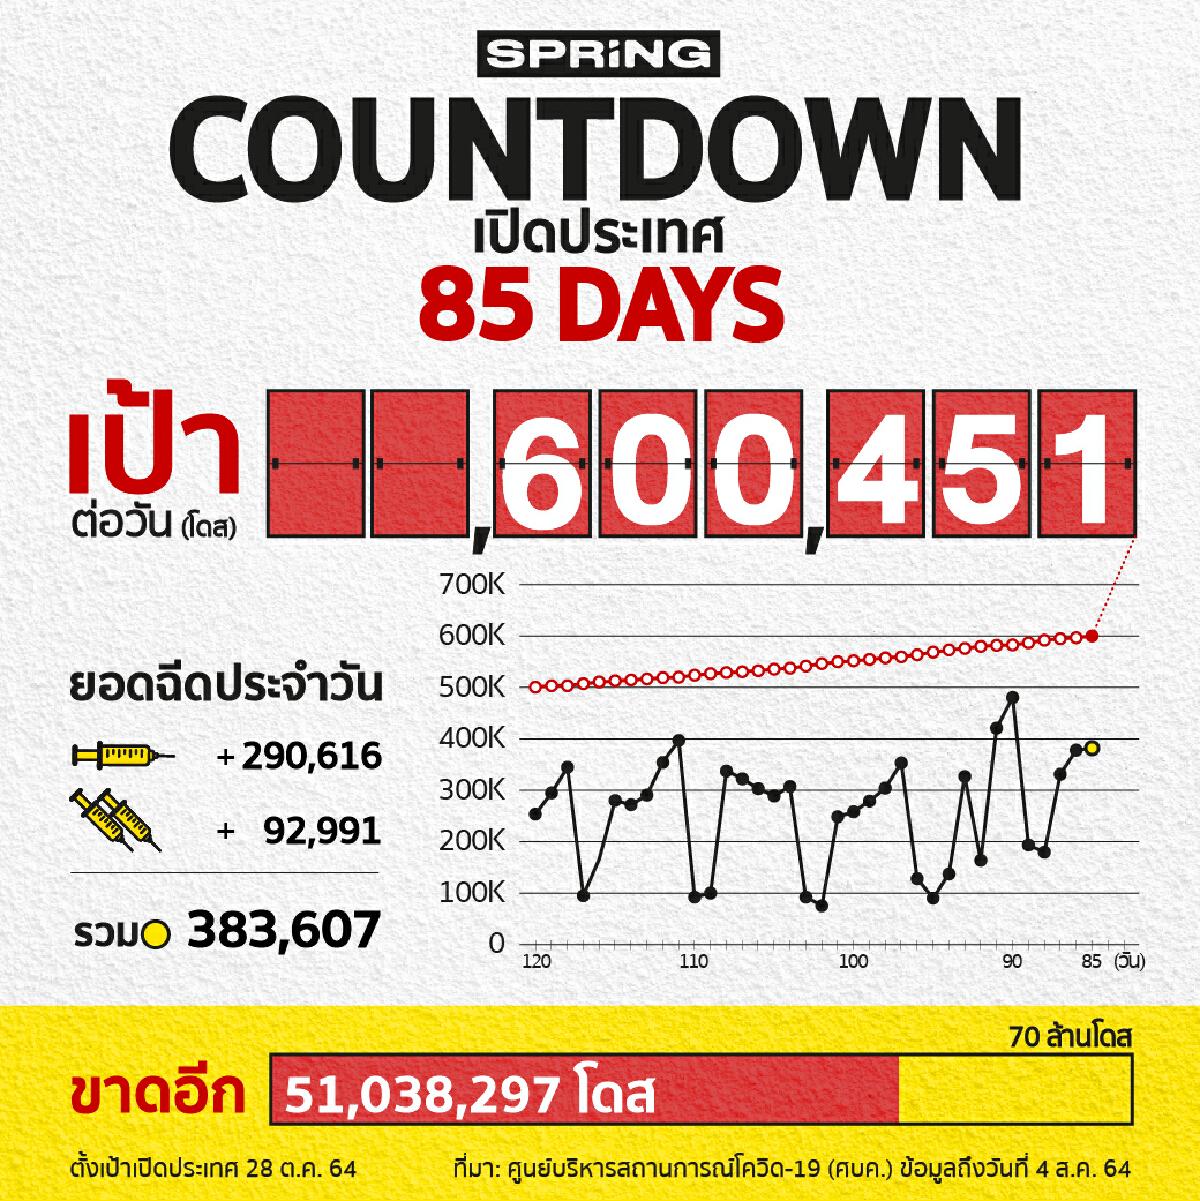 COUNTDOWN! เปิดประเทศใน 85 วัน ฉีดวัคซีนโควิด 383,607 โดส